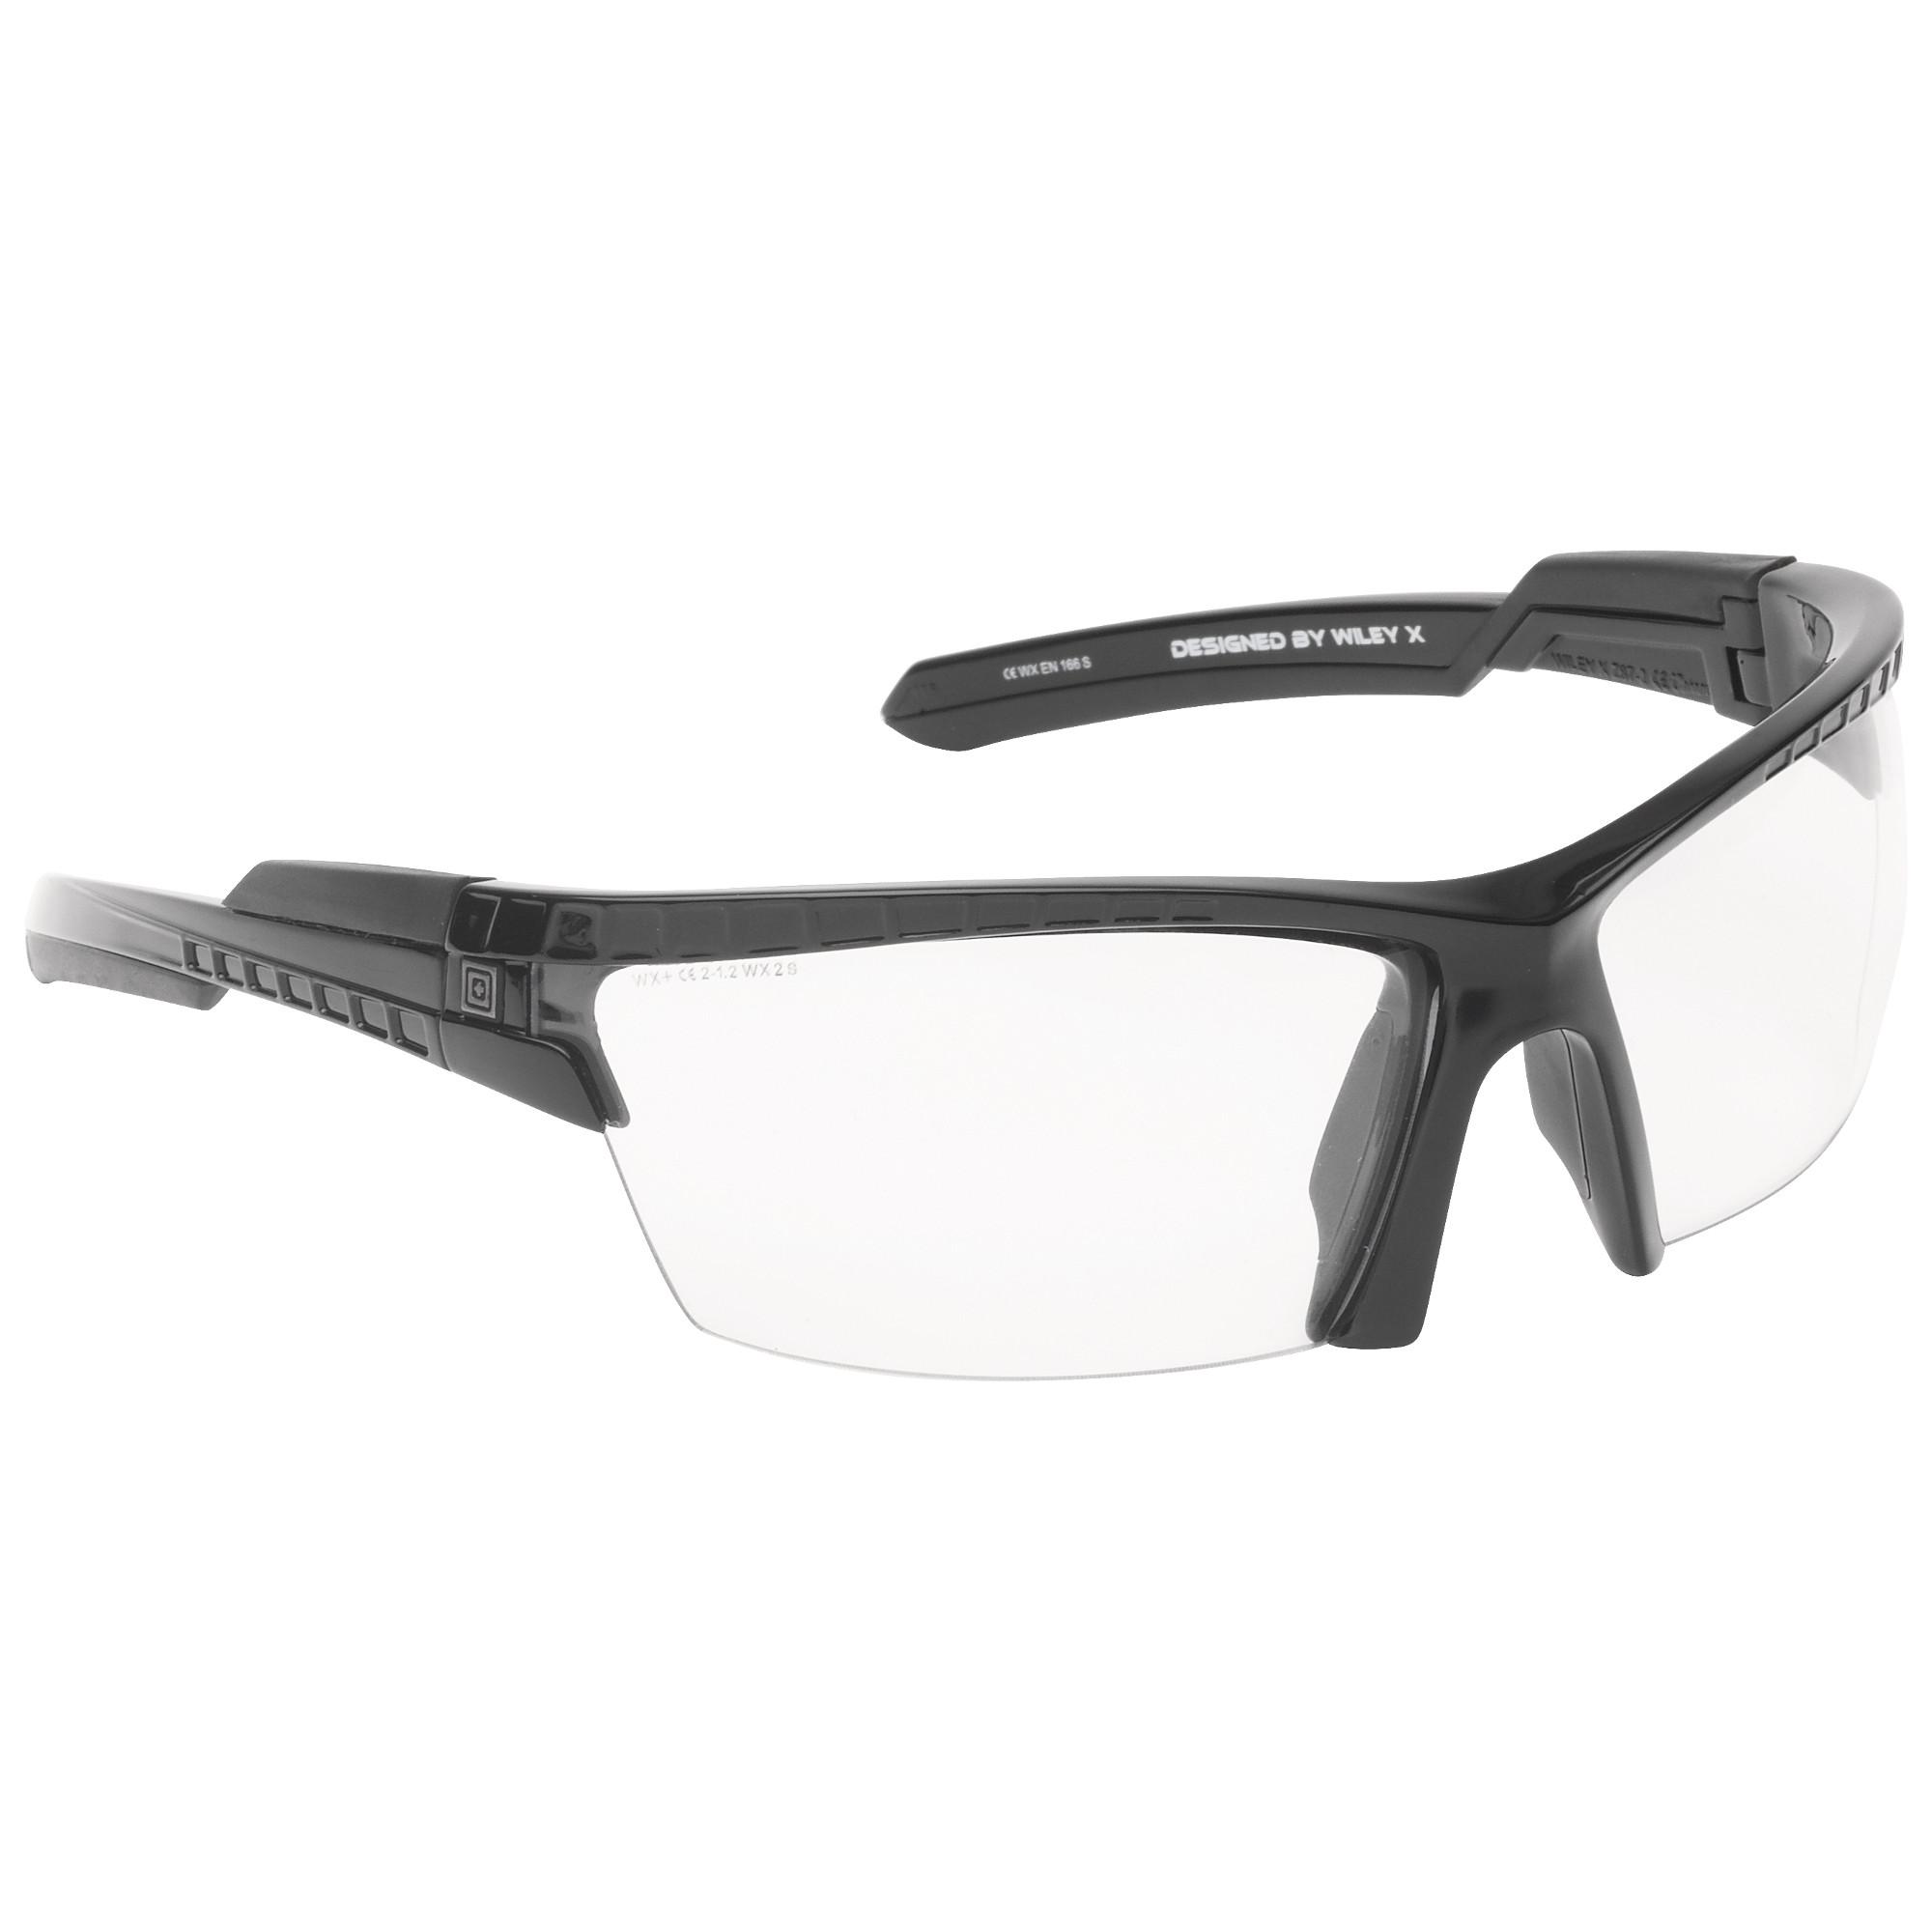 Buy 5.11 Tactical MenS Cavu™ Half Frame Replacement Lenses - 5.11 ...